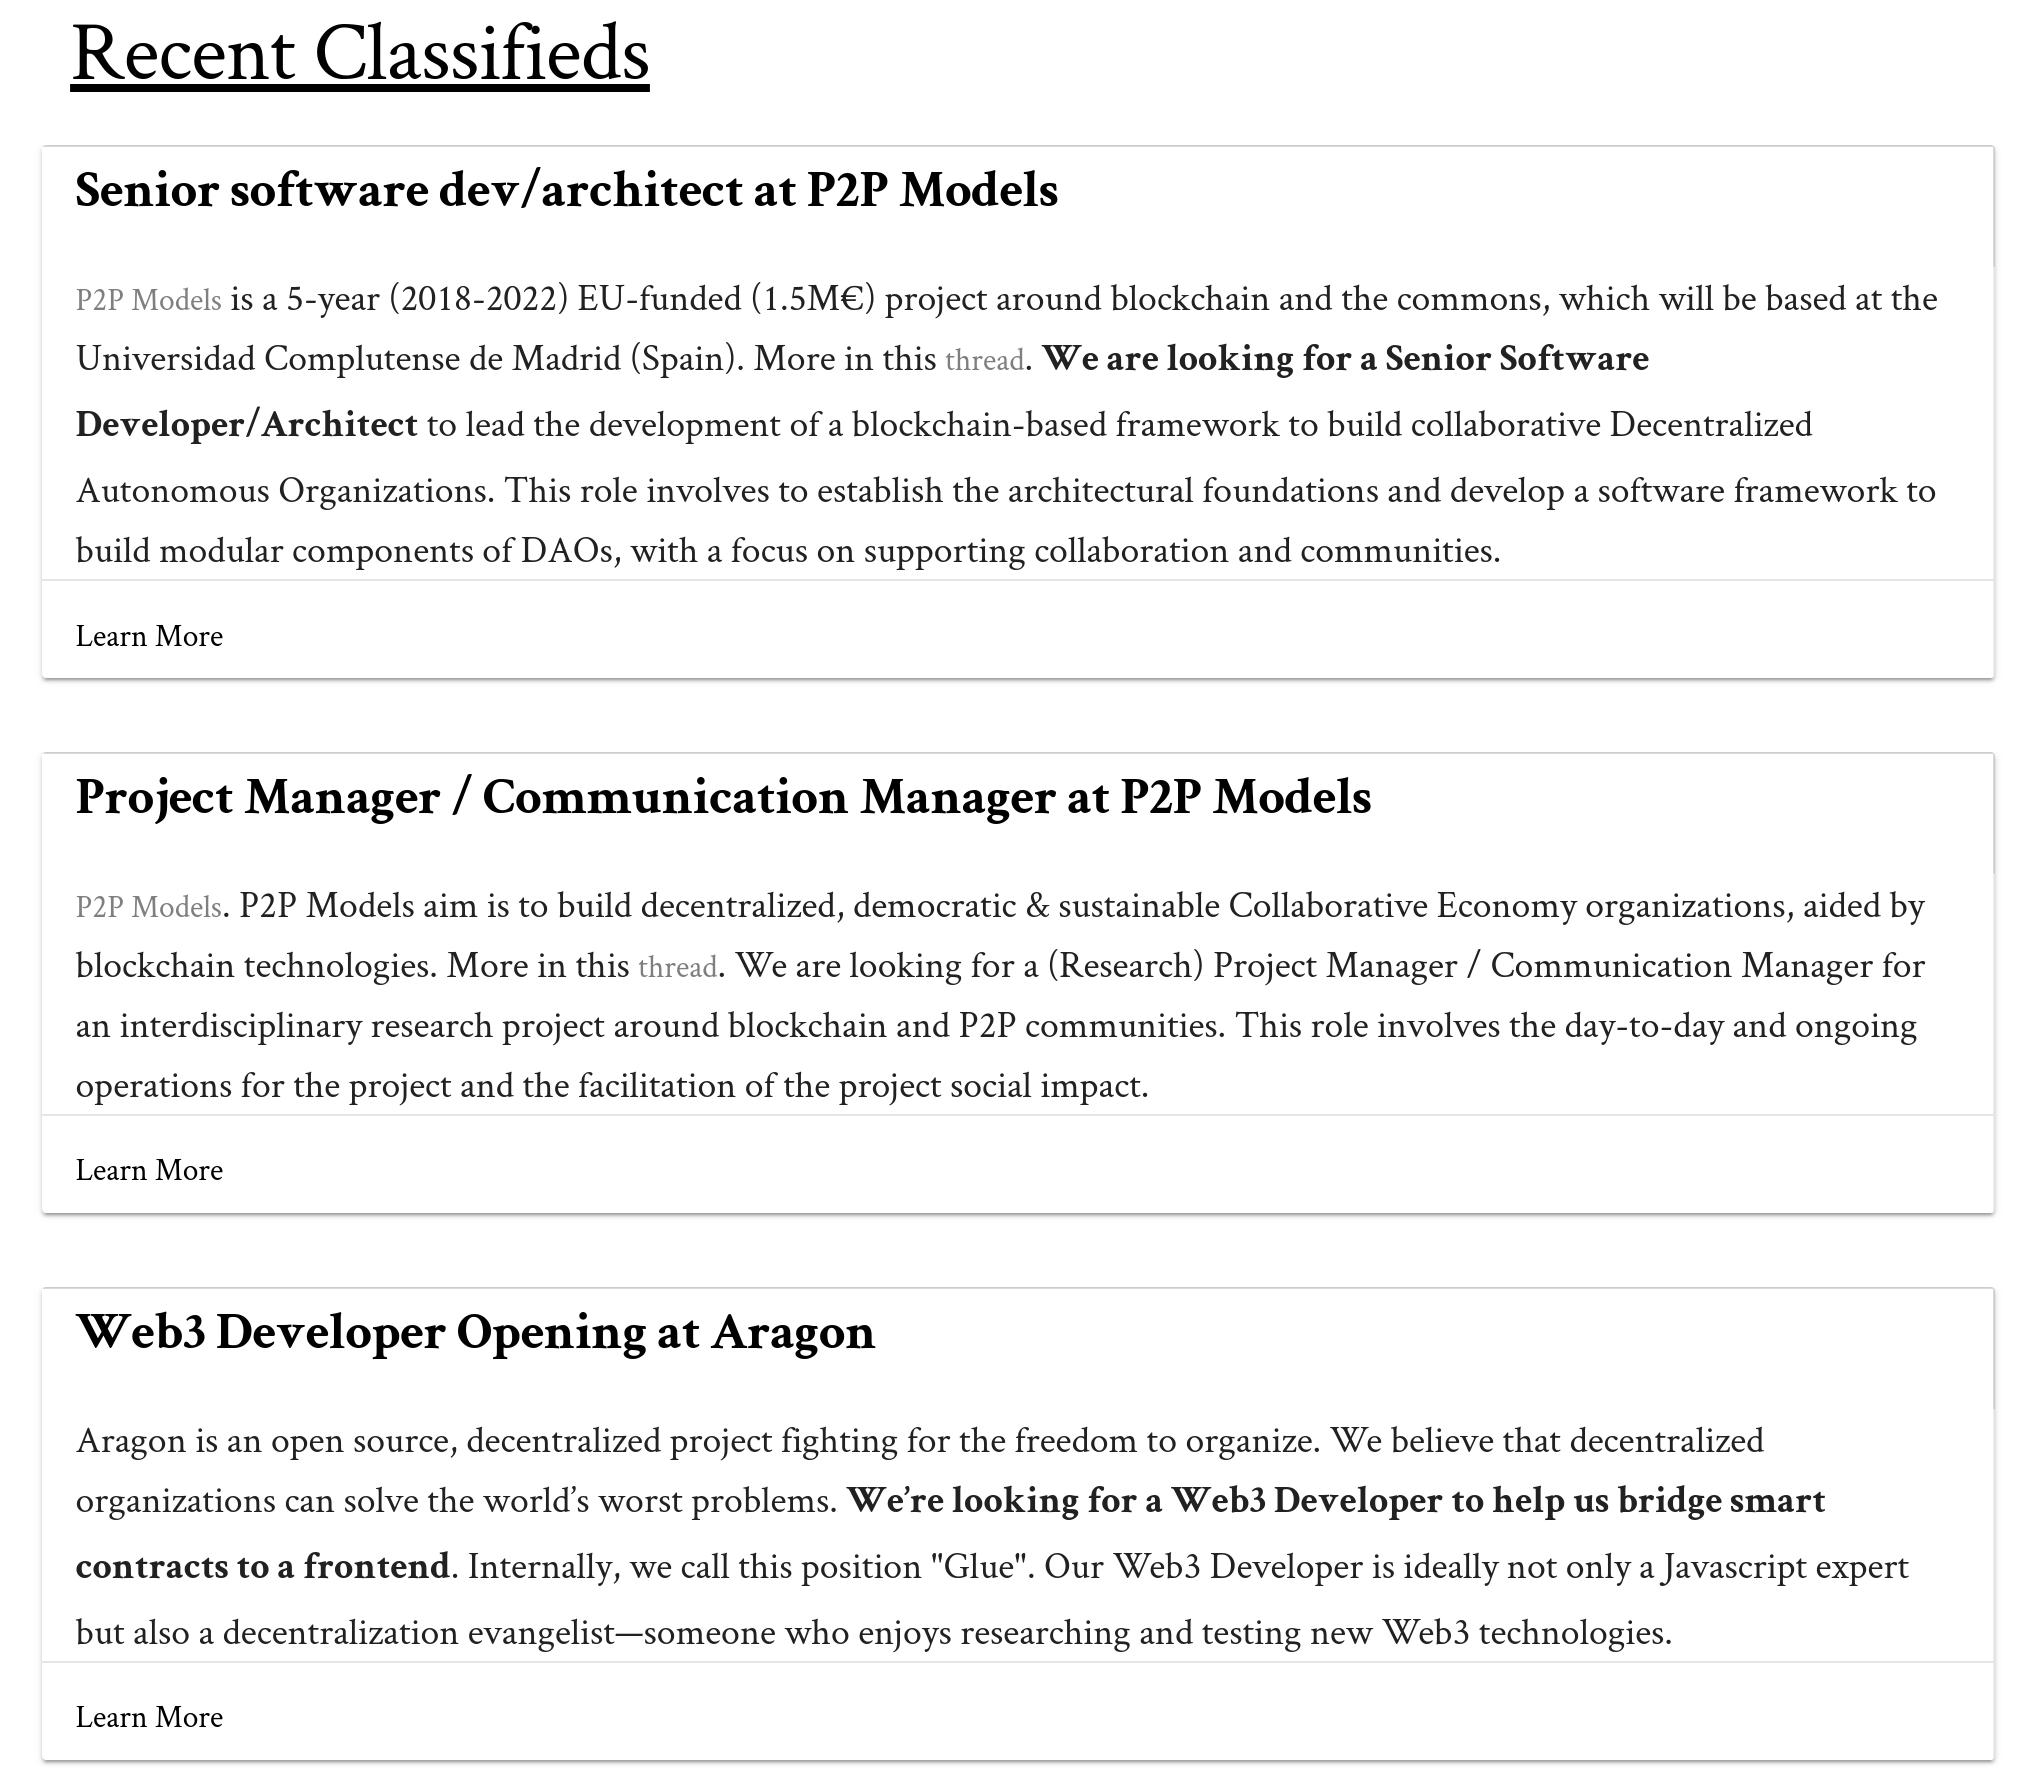 recent_classifieds